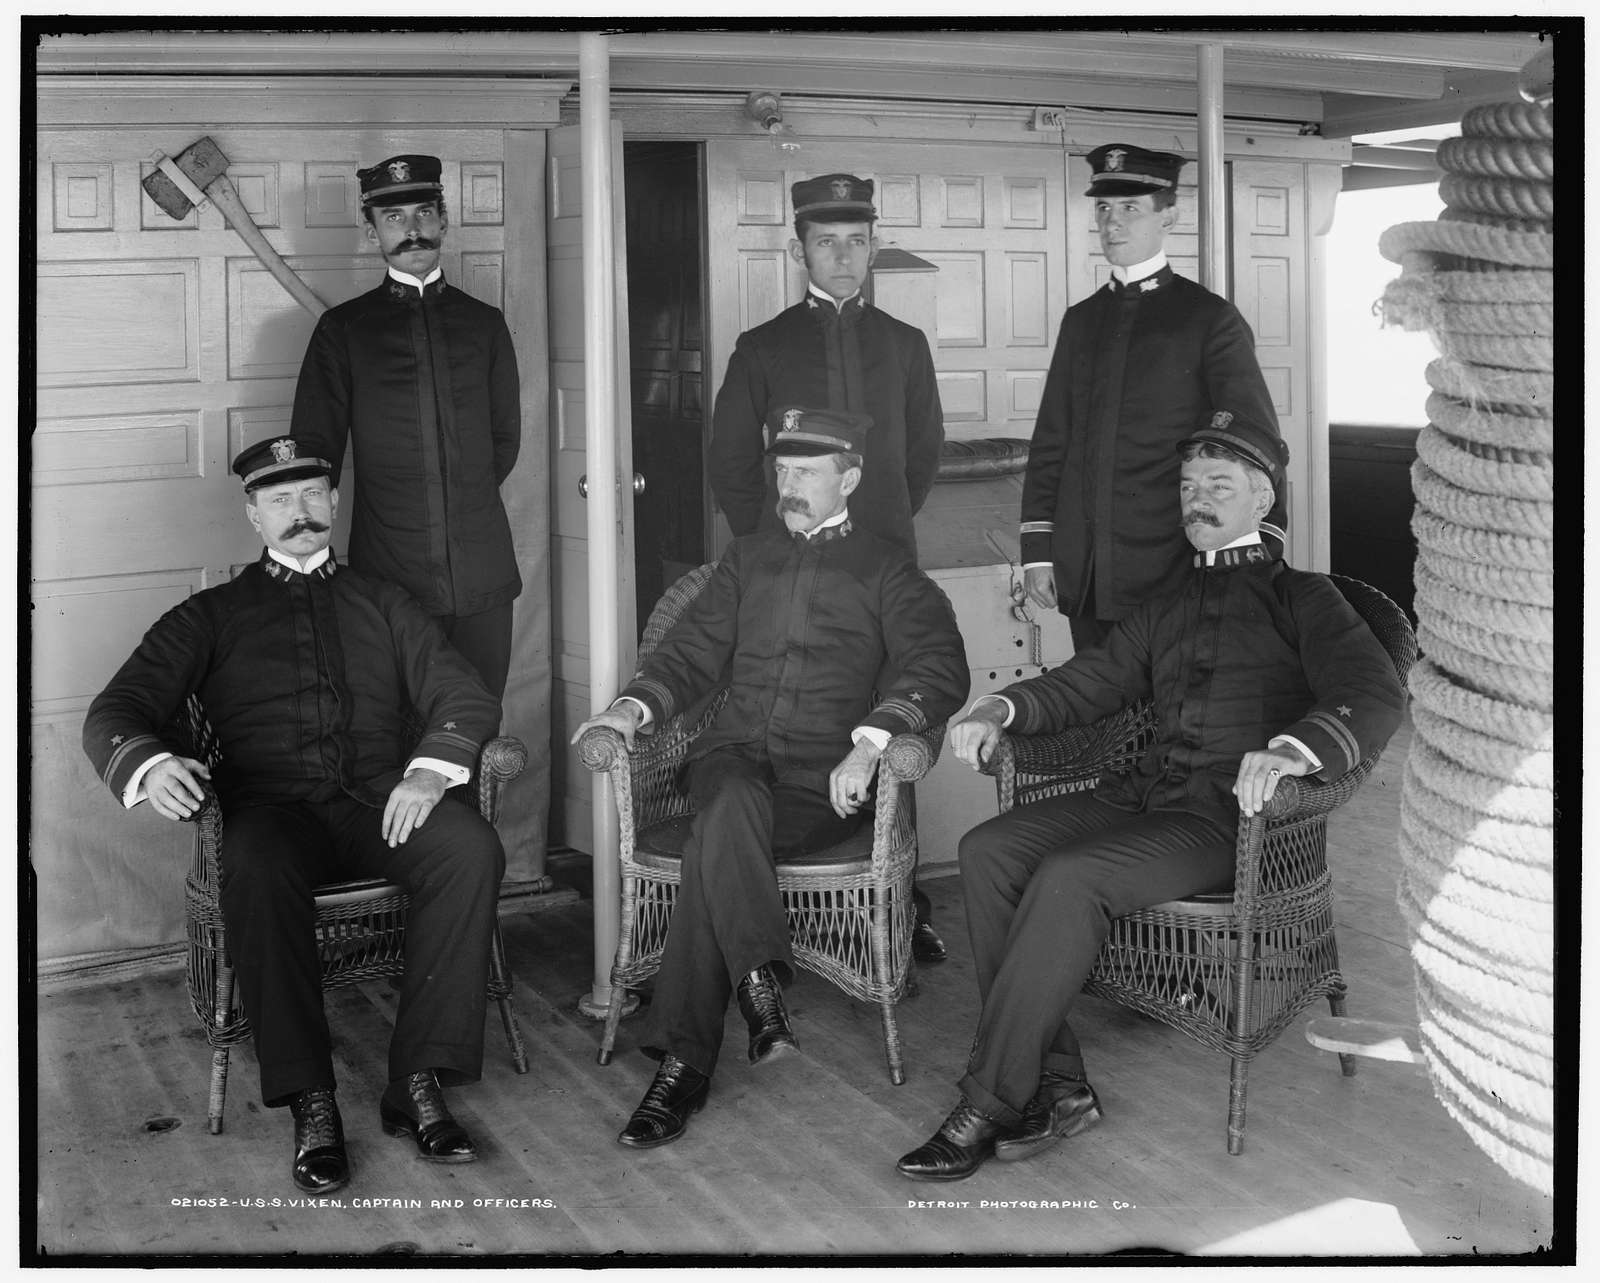 U.S.S. Vixen, Capt. and officers